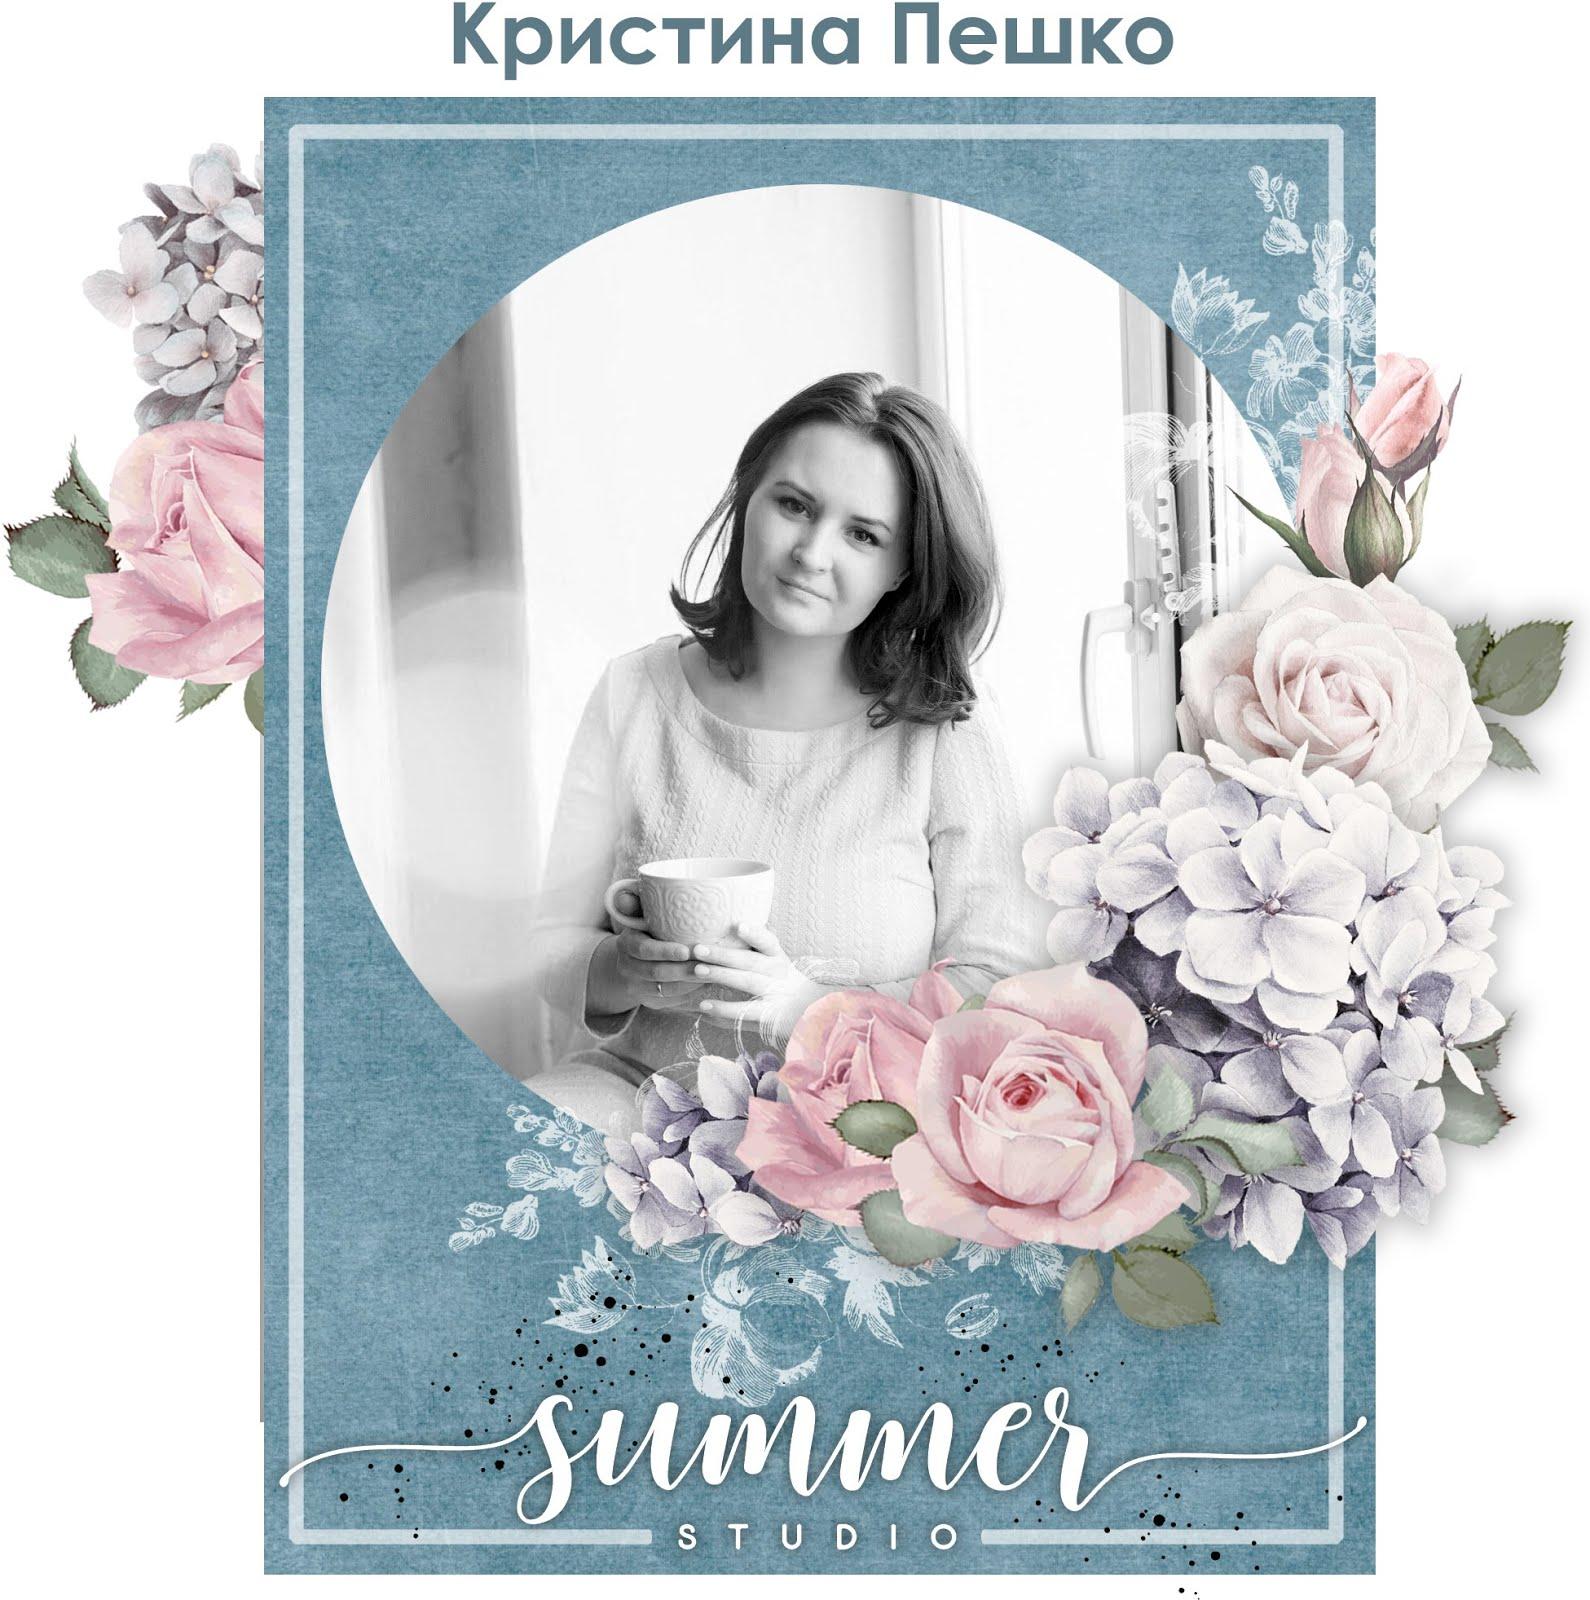 ДК "Summer Studio"